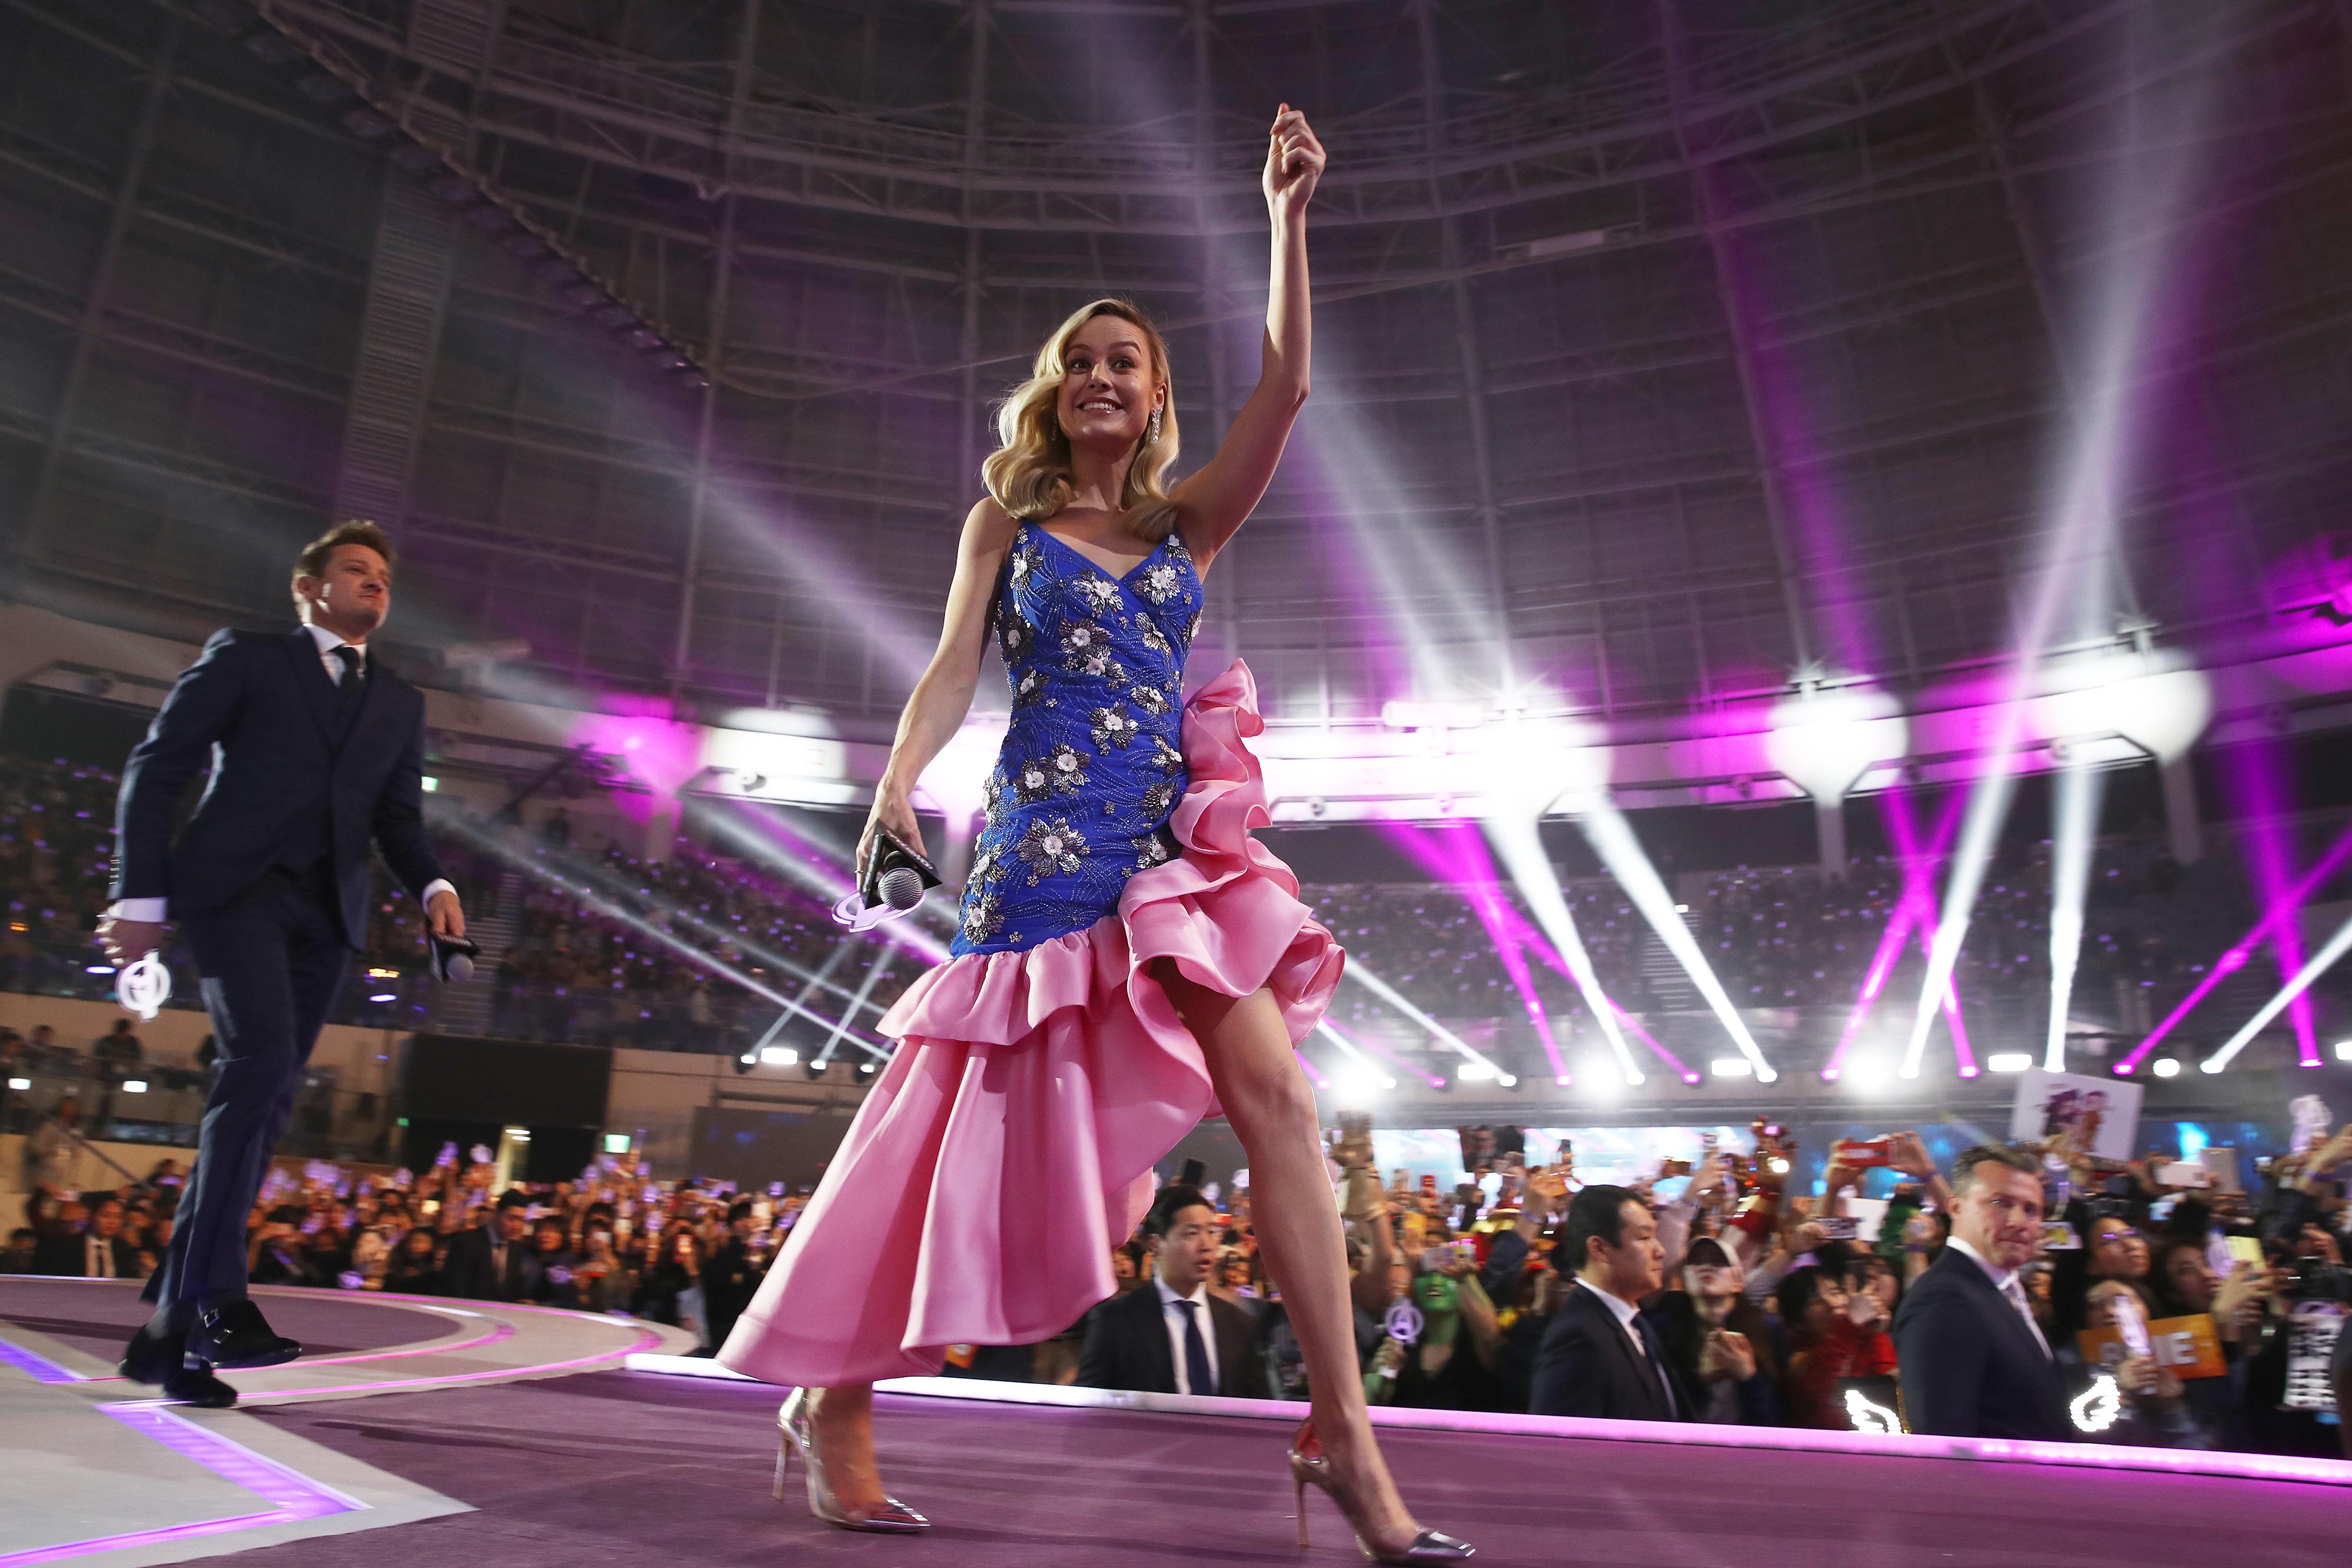 Brie Larson and Jeremy Renner attend the fan event for Marvel Studios' 'Avengers: Endgame'